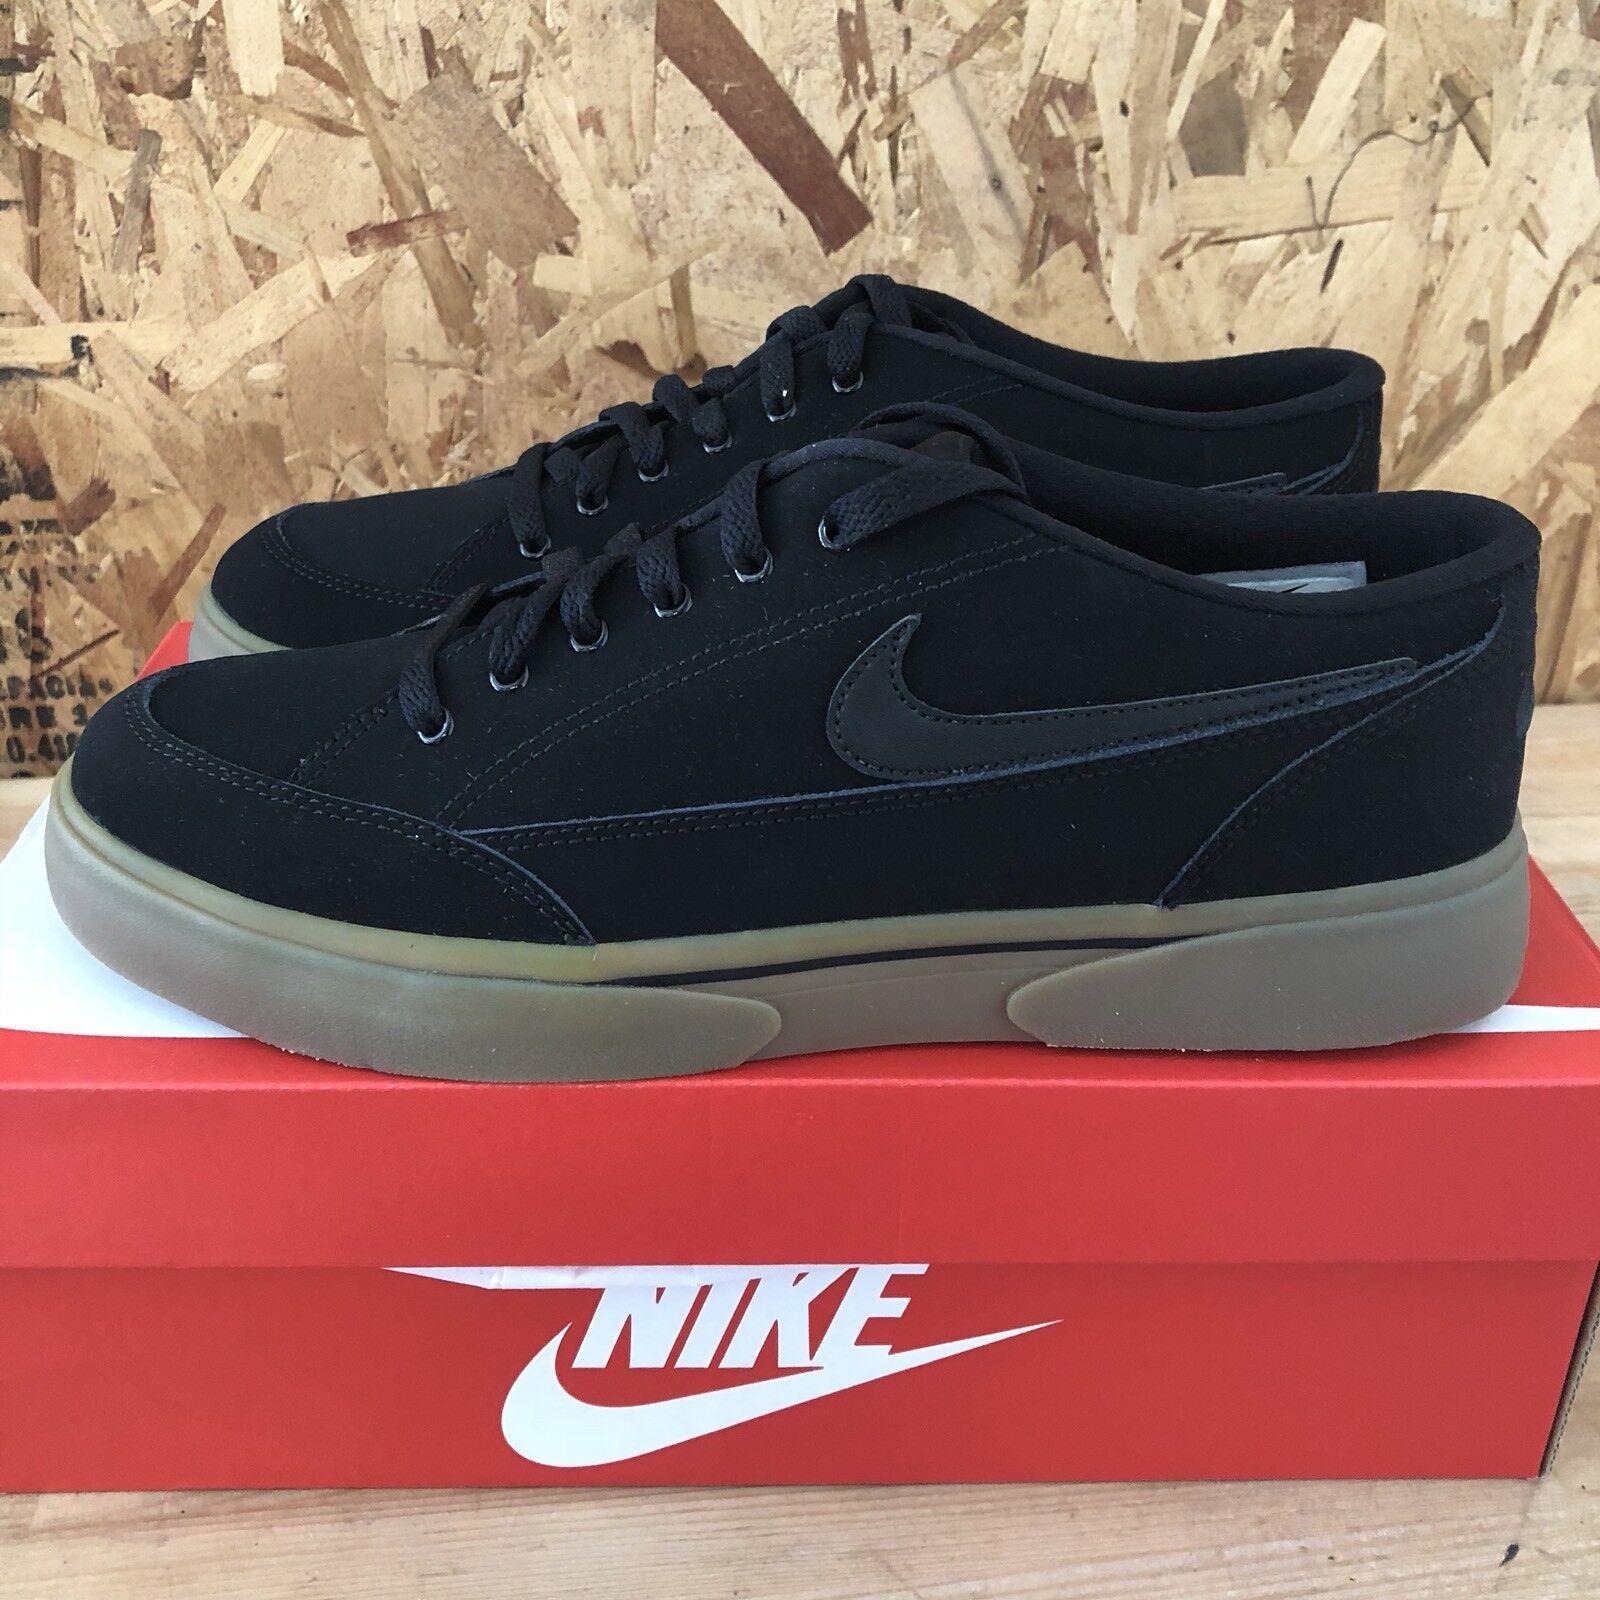 Nike GTS 16 Nubuck - Black   Black   Gum  Size 12 New